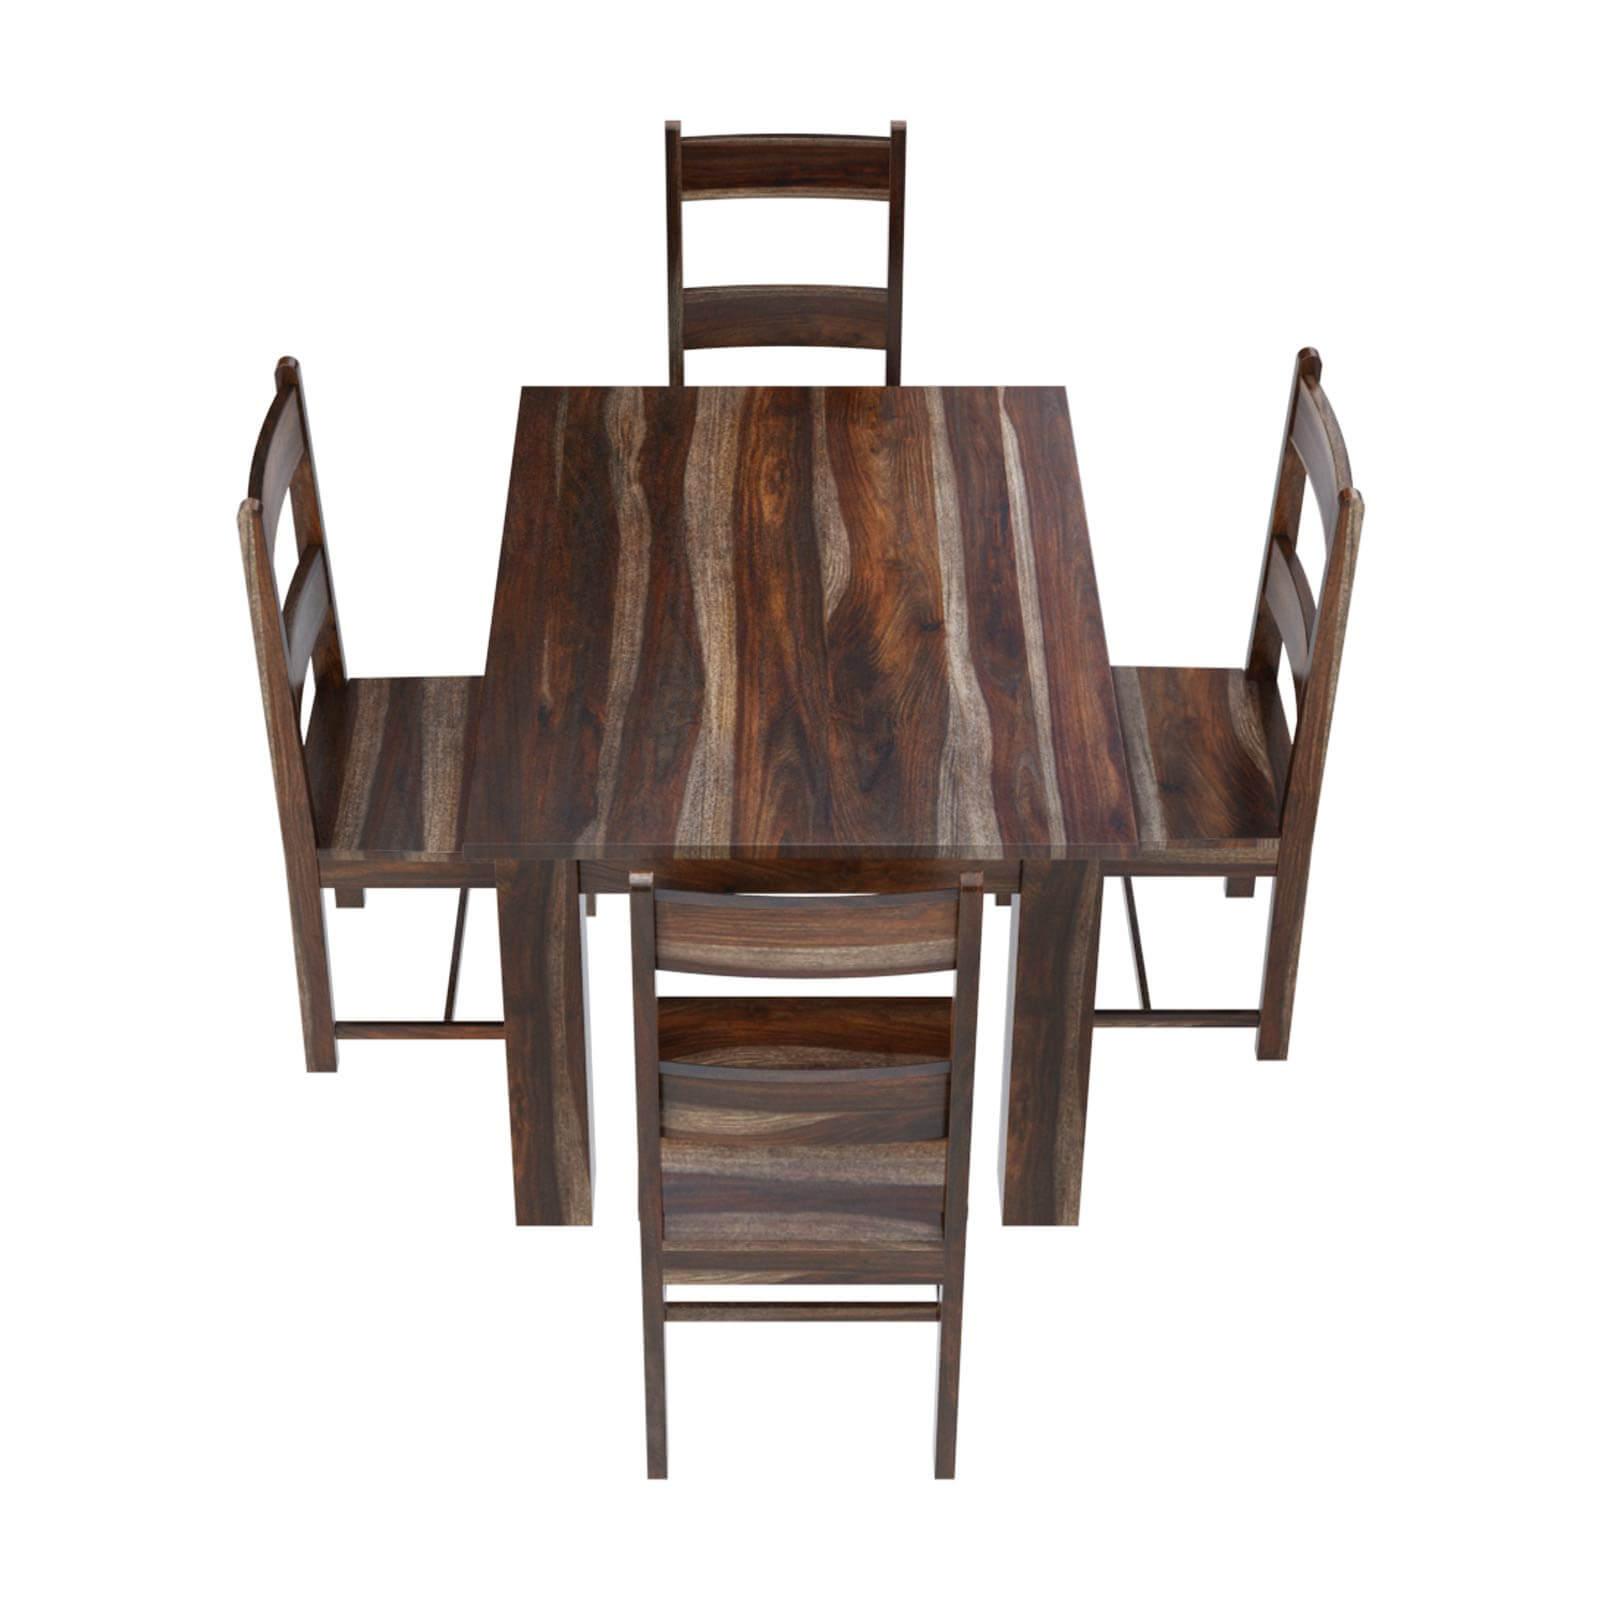 Rustic Modern Wood Dining Chair: Alabama Modern Rustic Solid Wood Dining Table And Chair Set